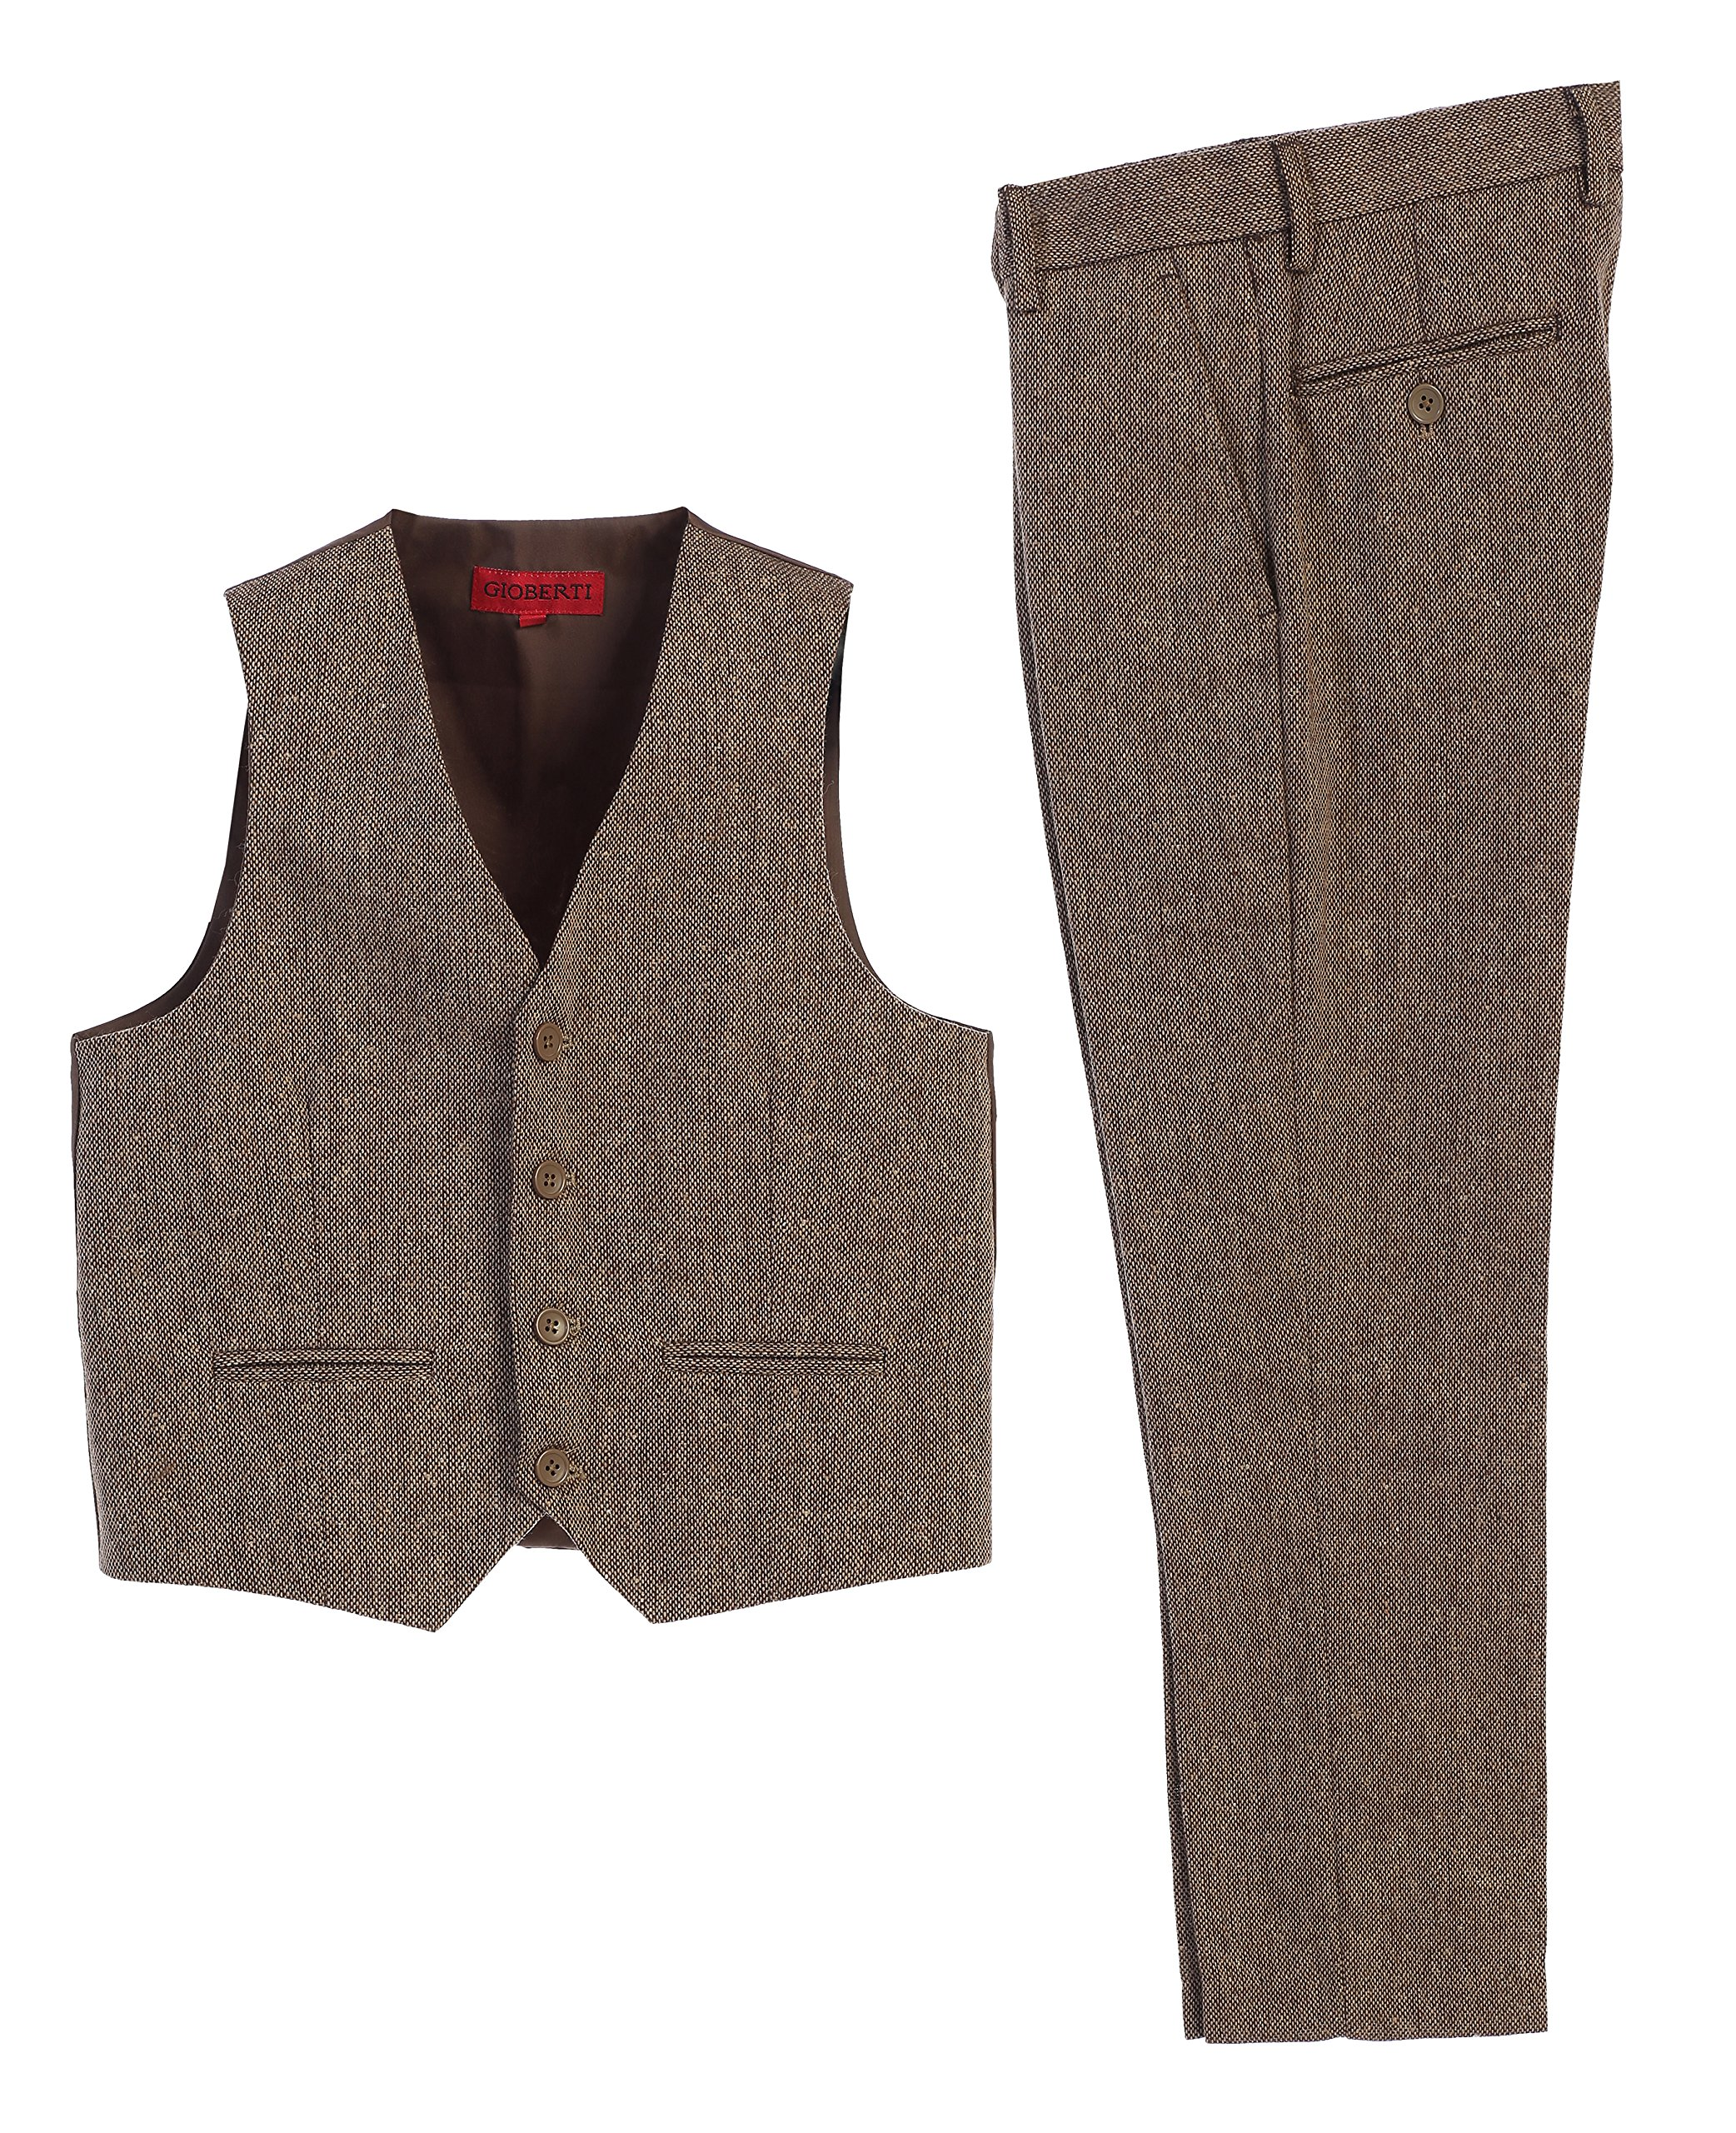 Gioberti Boy's 2 Piece Plaid Vest and Pants Set, Barleycorn Brown, Size 3T